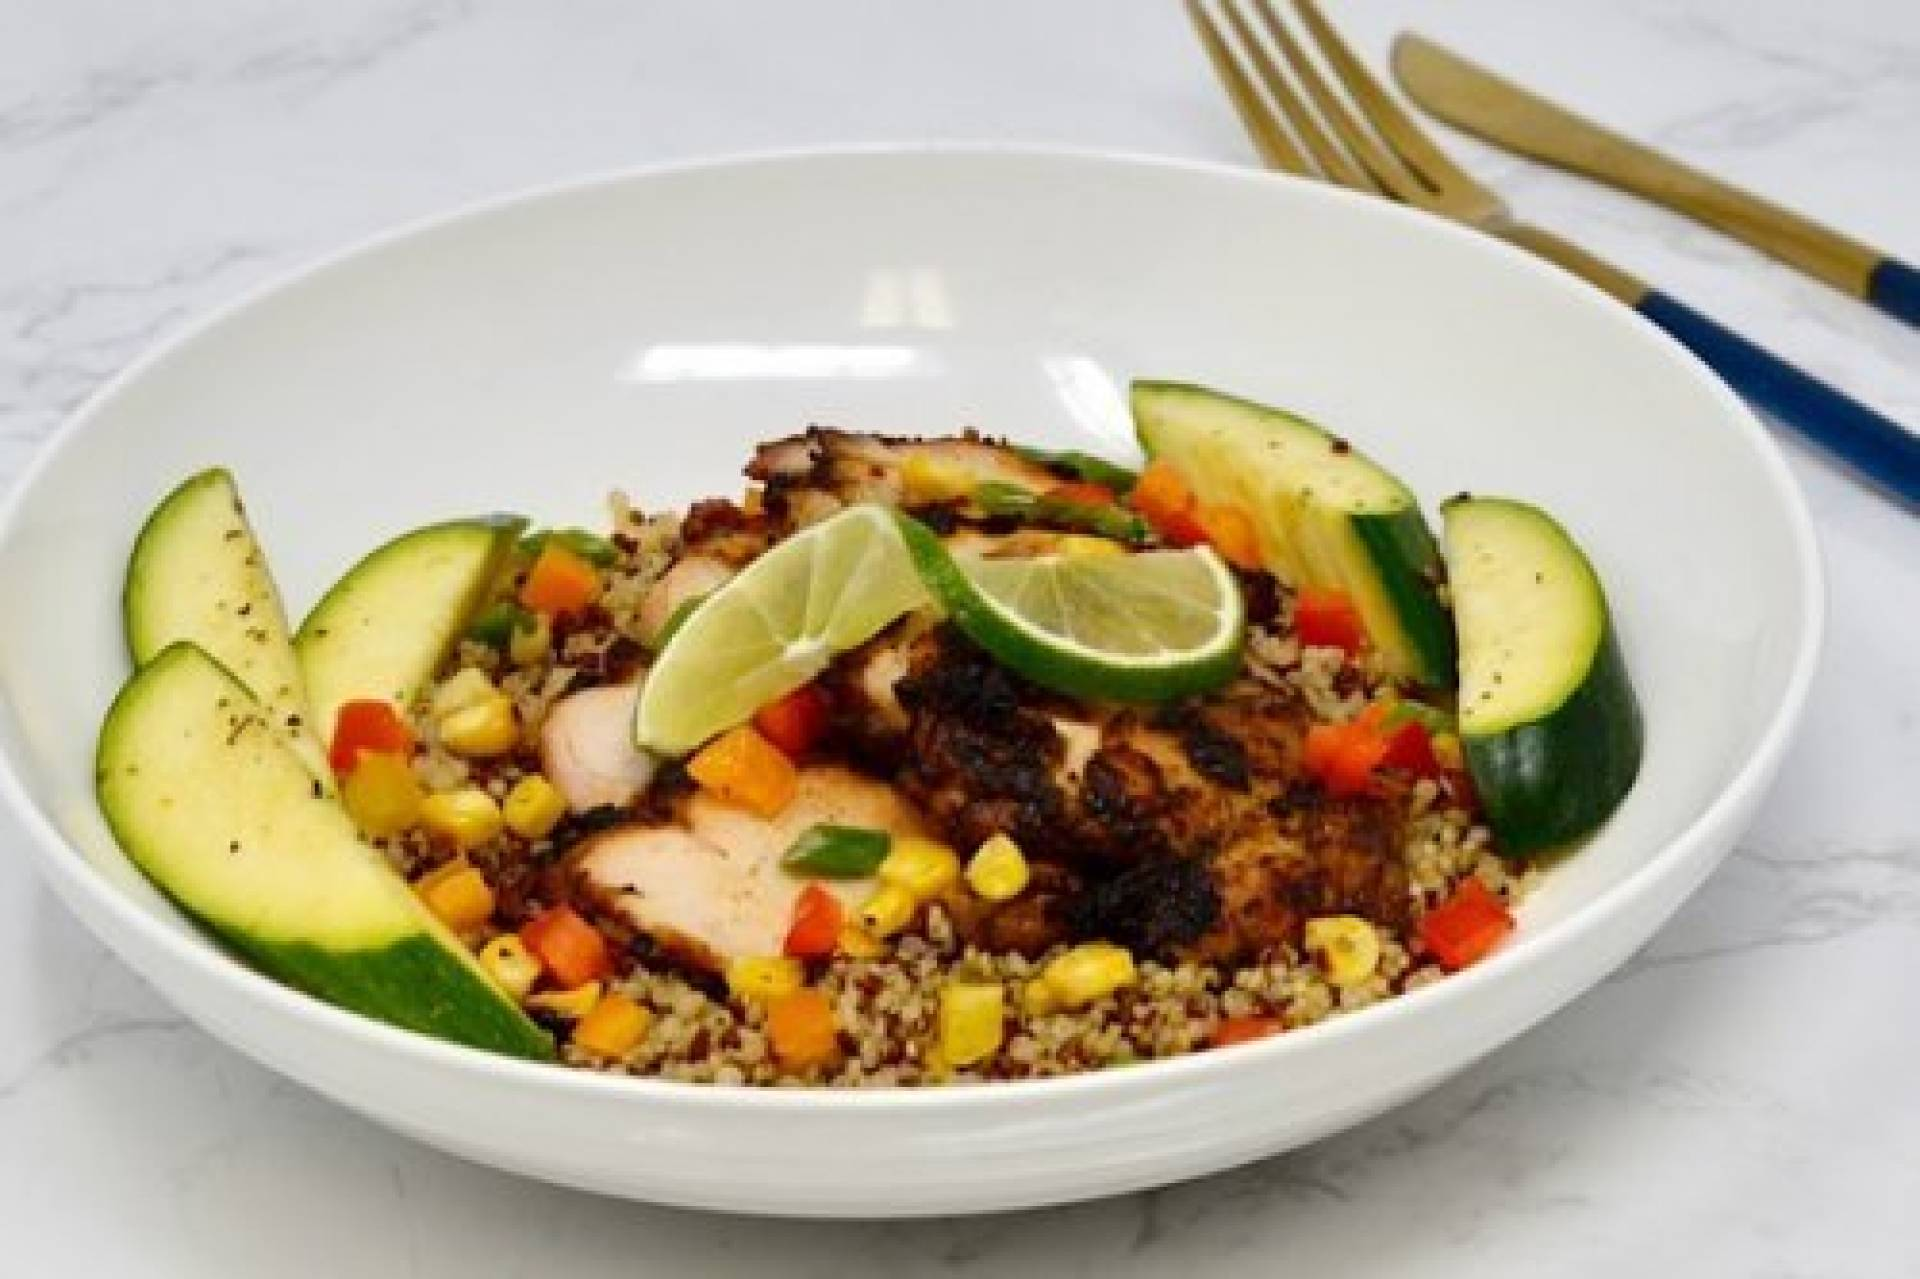 Smoked Mesquite Chicken with quinoa